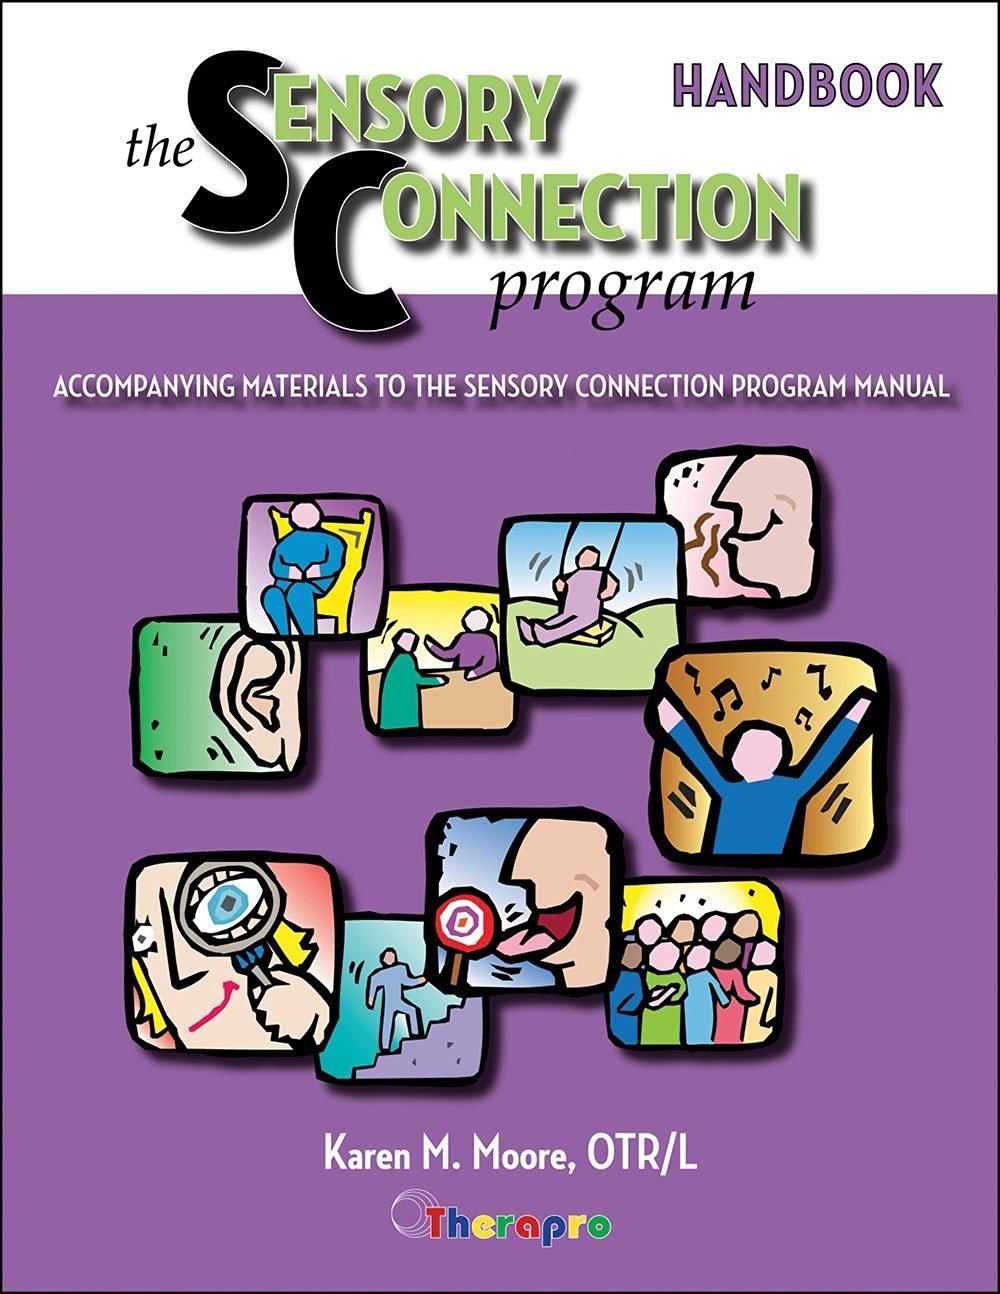 The Sensory Connection Program Handbook: Accompanying Materials to the Sensory Connection Program Manual (The Sensory Connection Program)